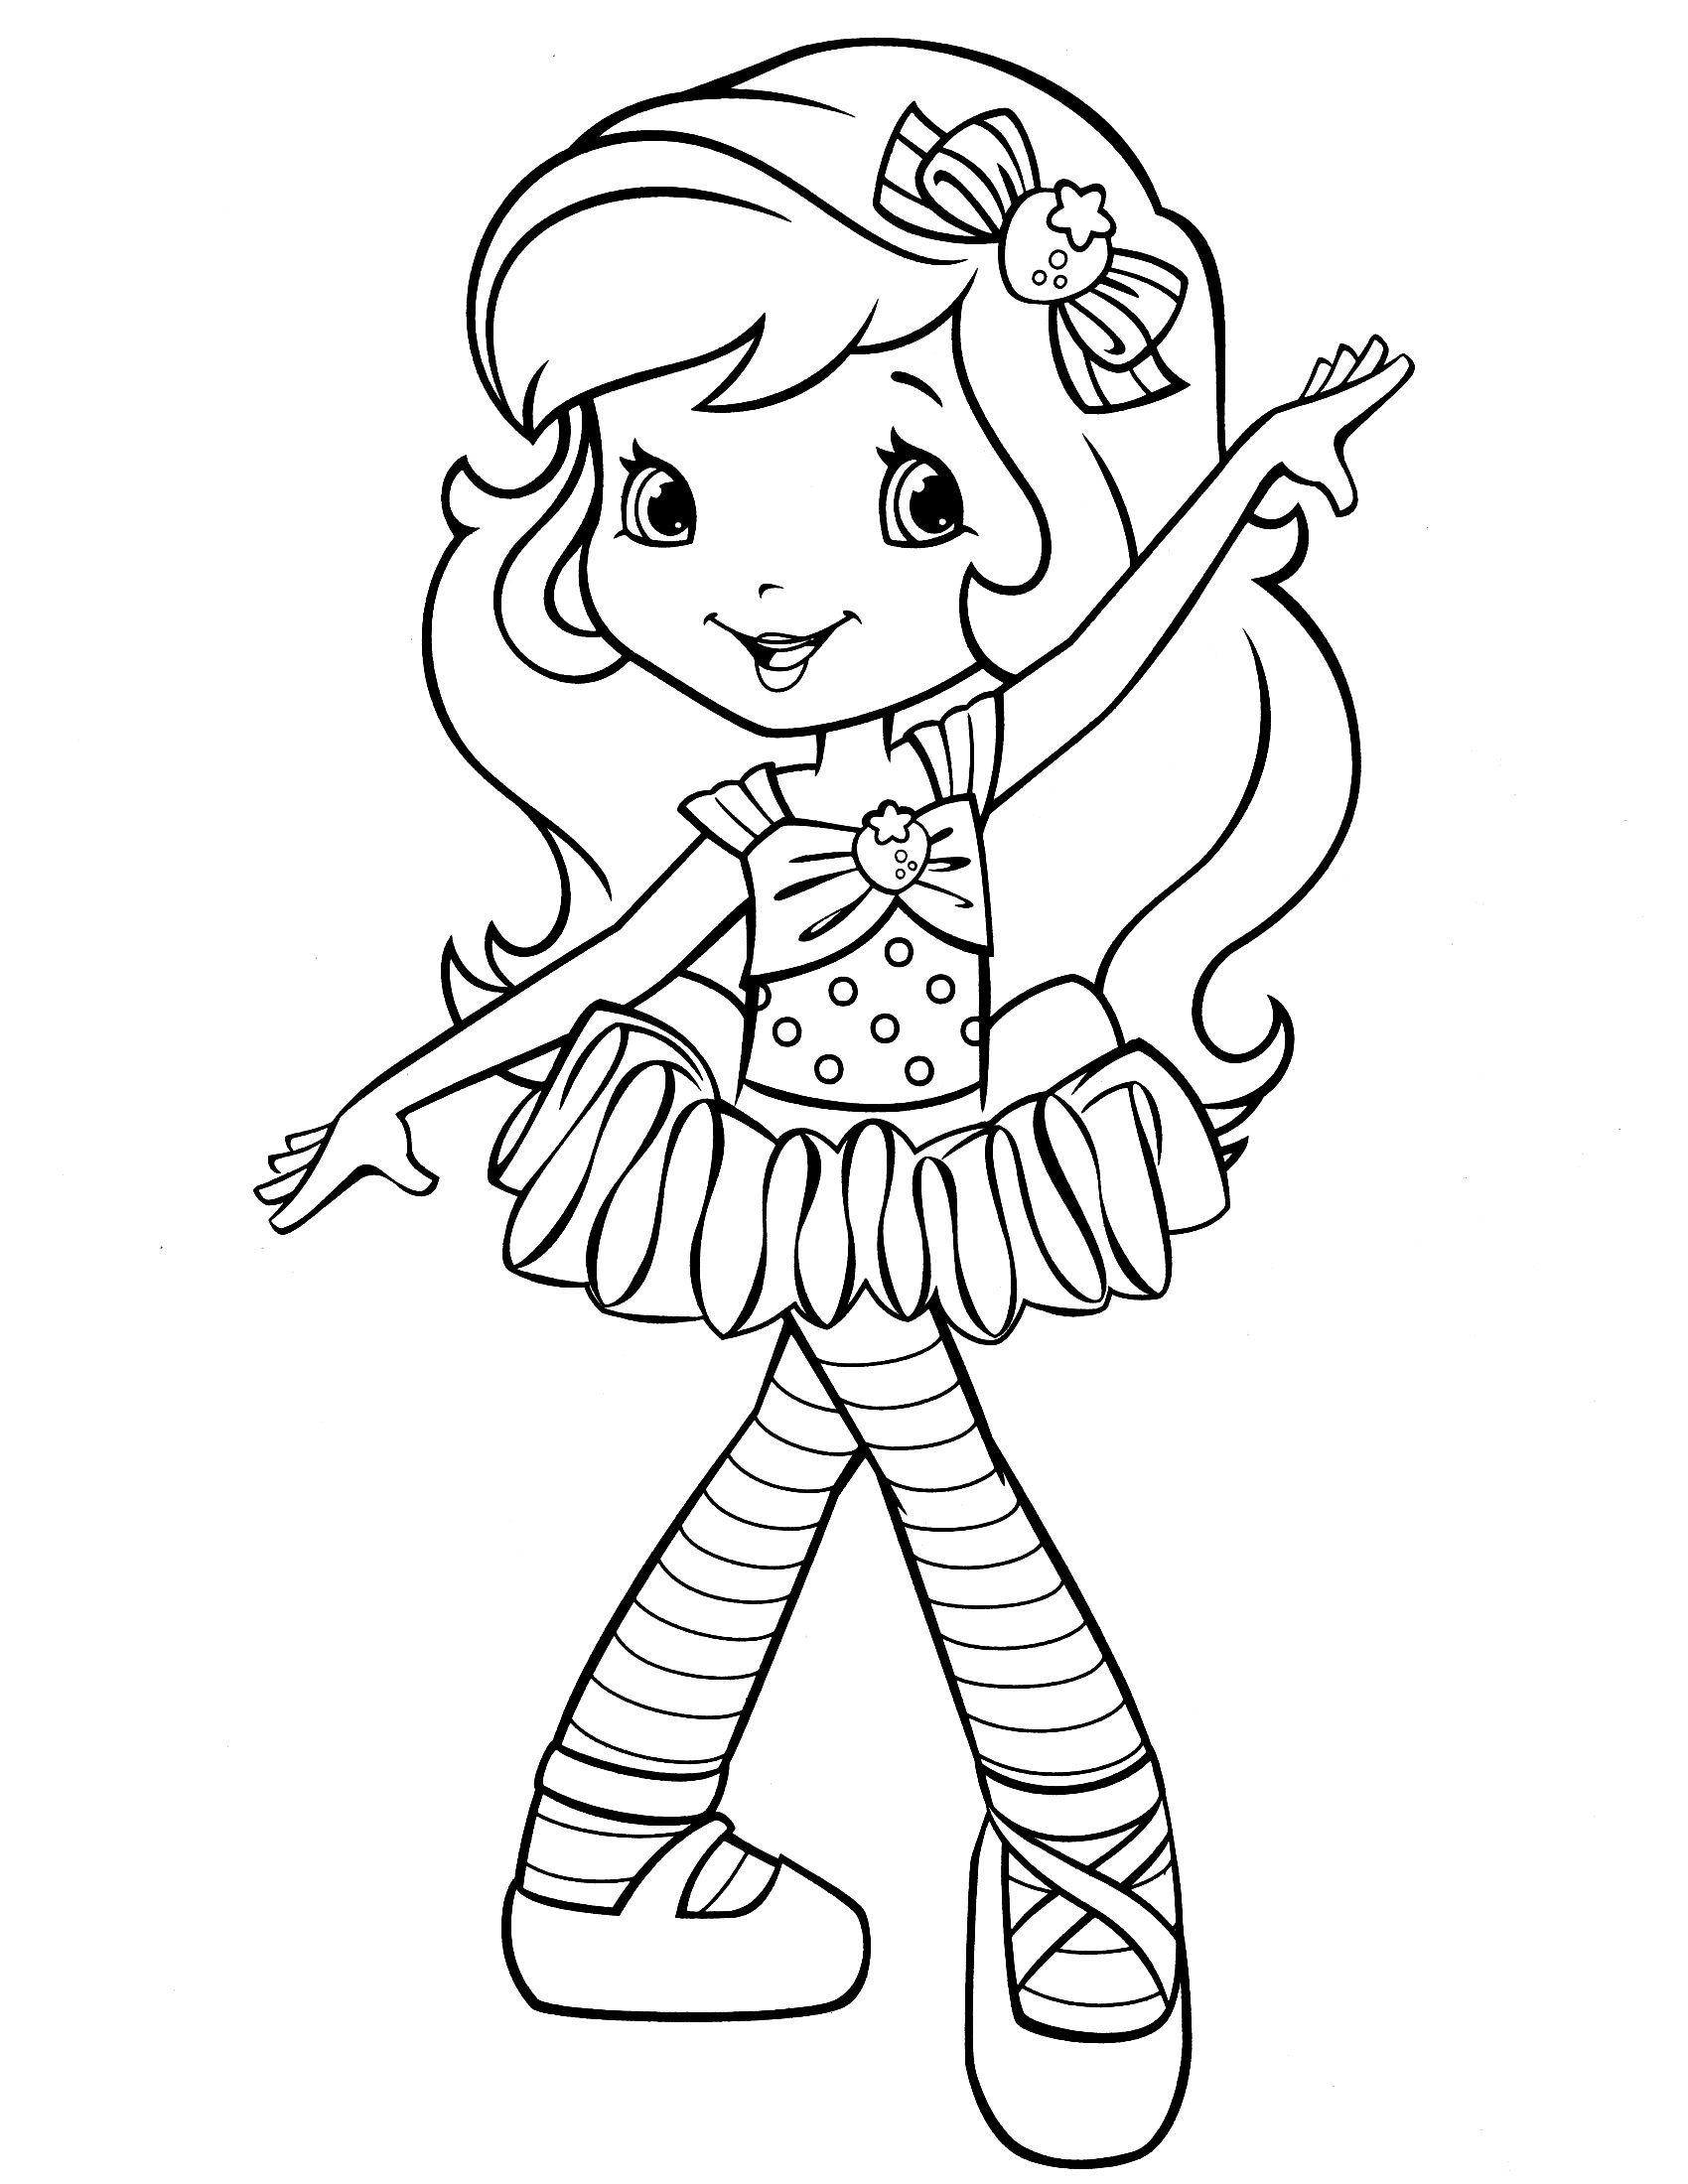 Strawberry Shortcake Coloring Page | Lenka Malovã¡nã